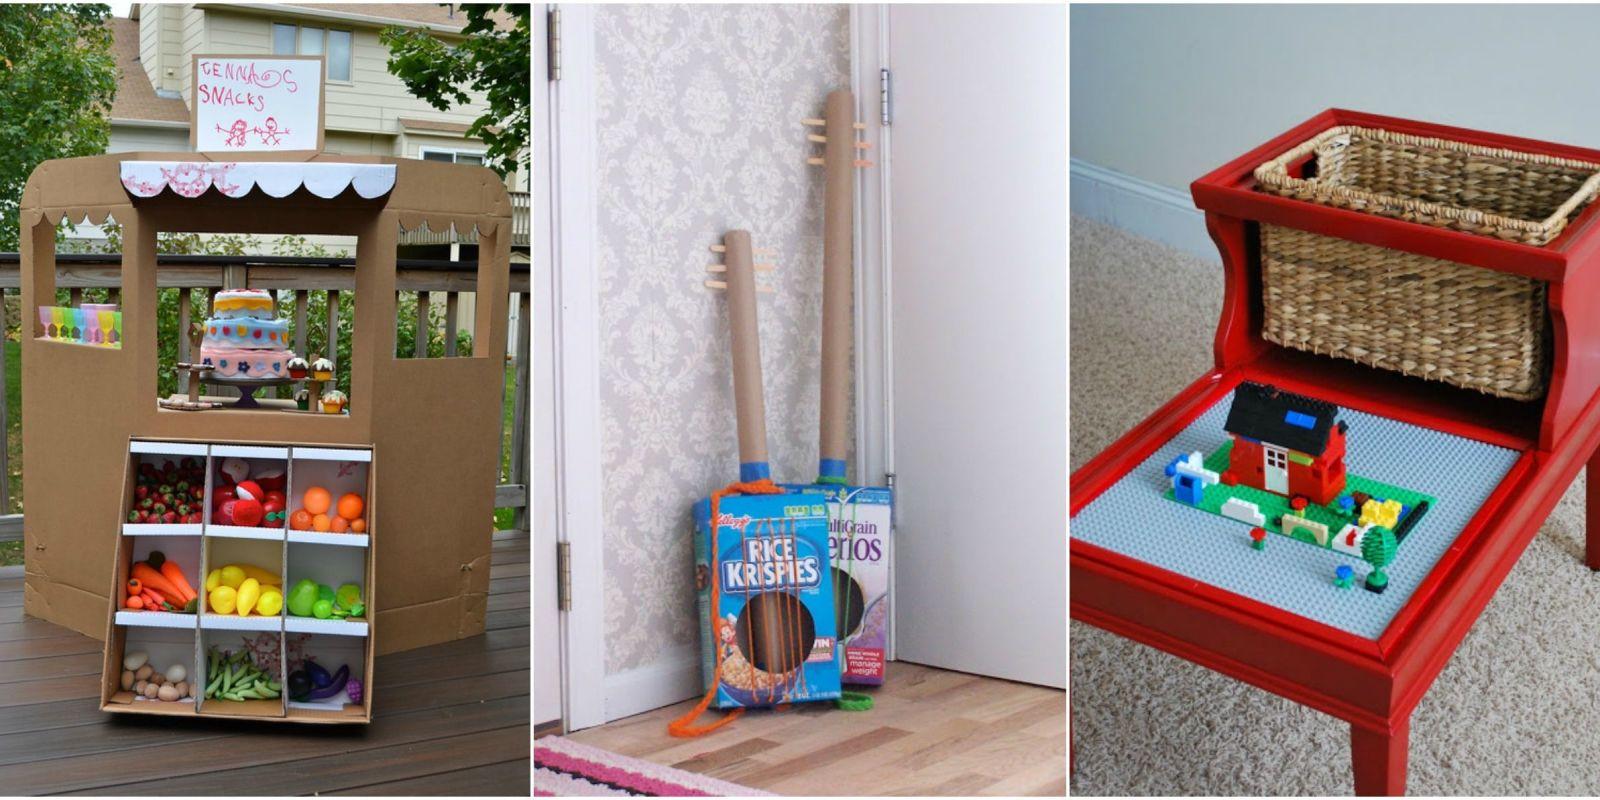 trash to treasure kids crafts diy projects to entertain kids. Black Bedroom Furniture Sets. Home Design Ideas